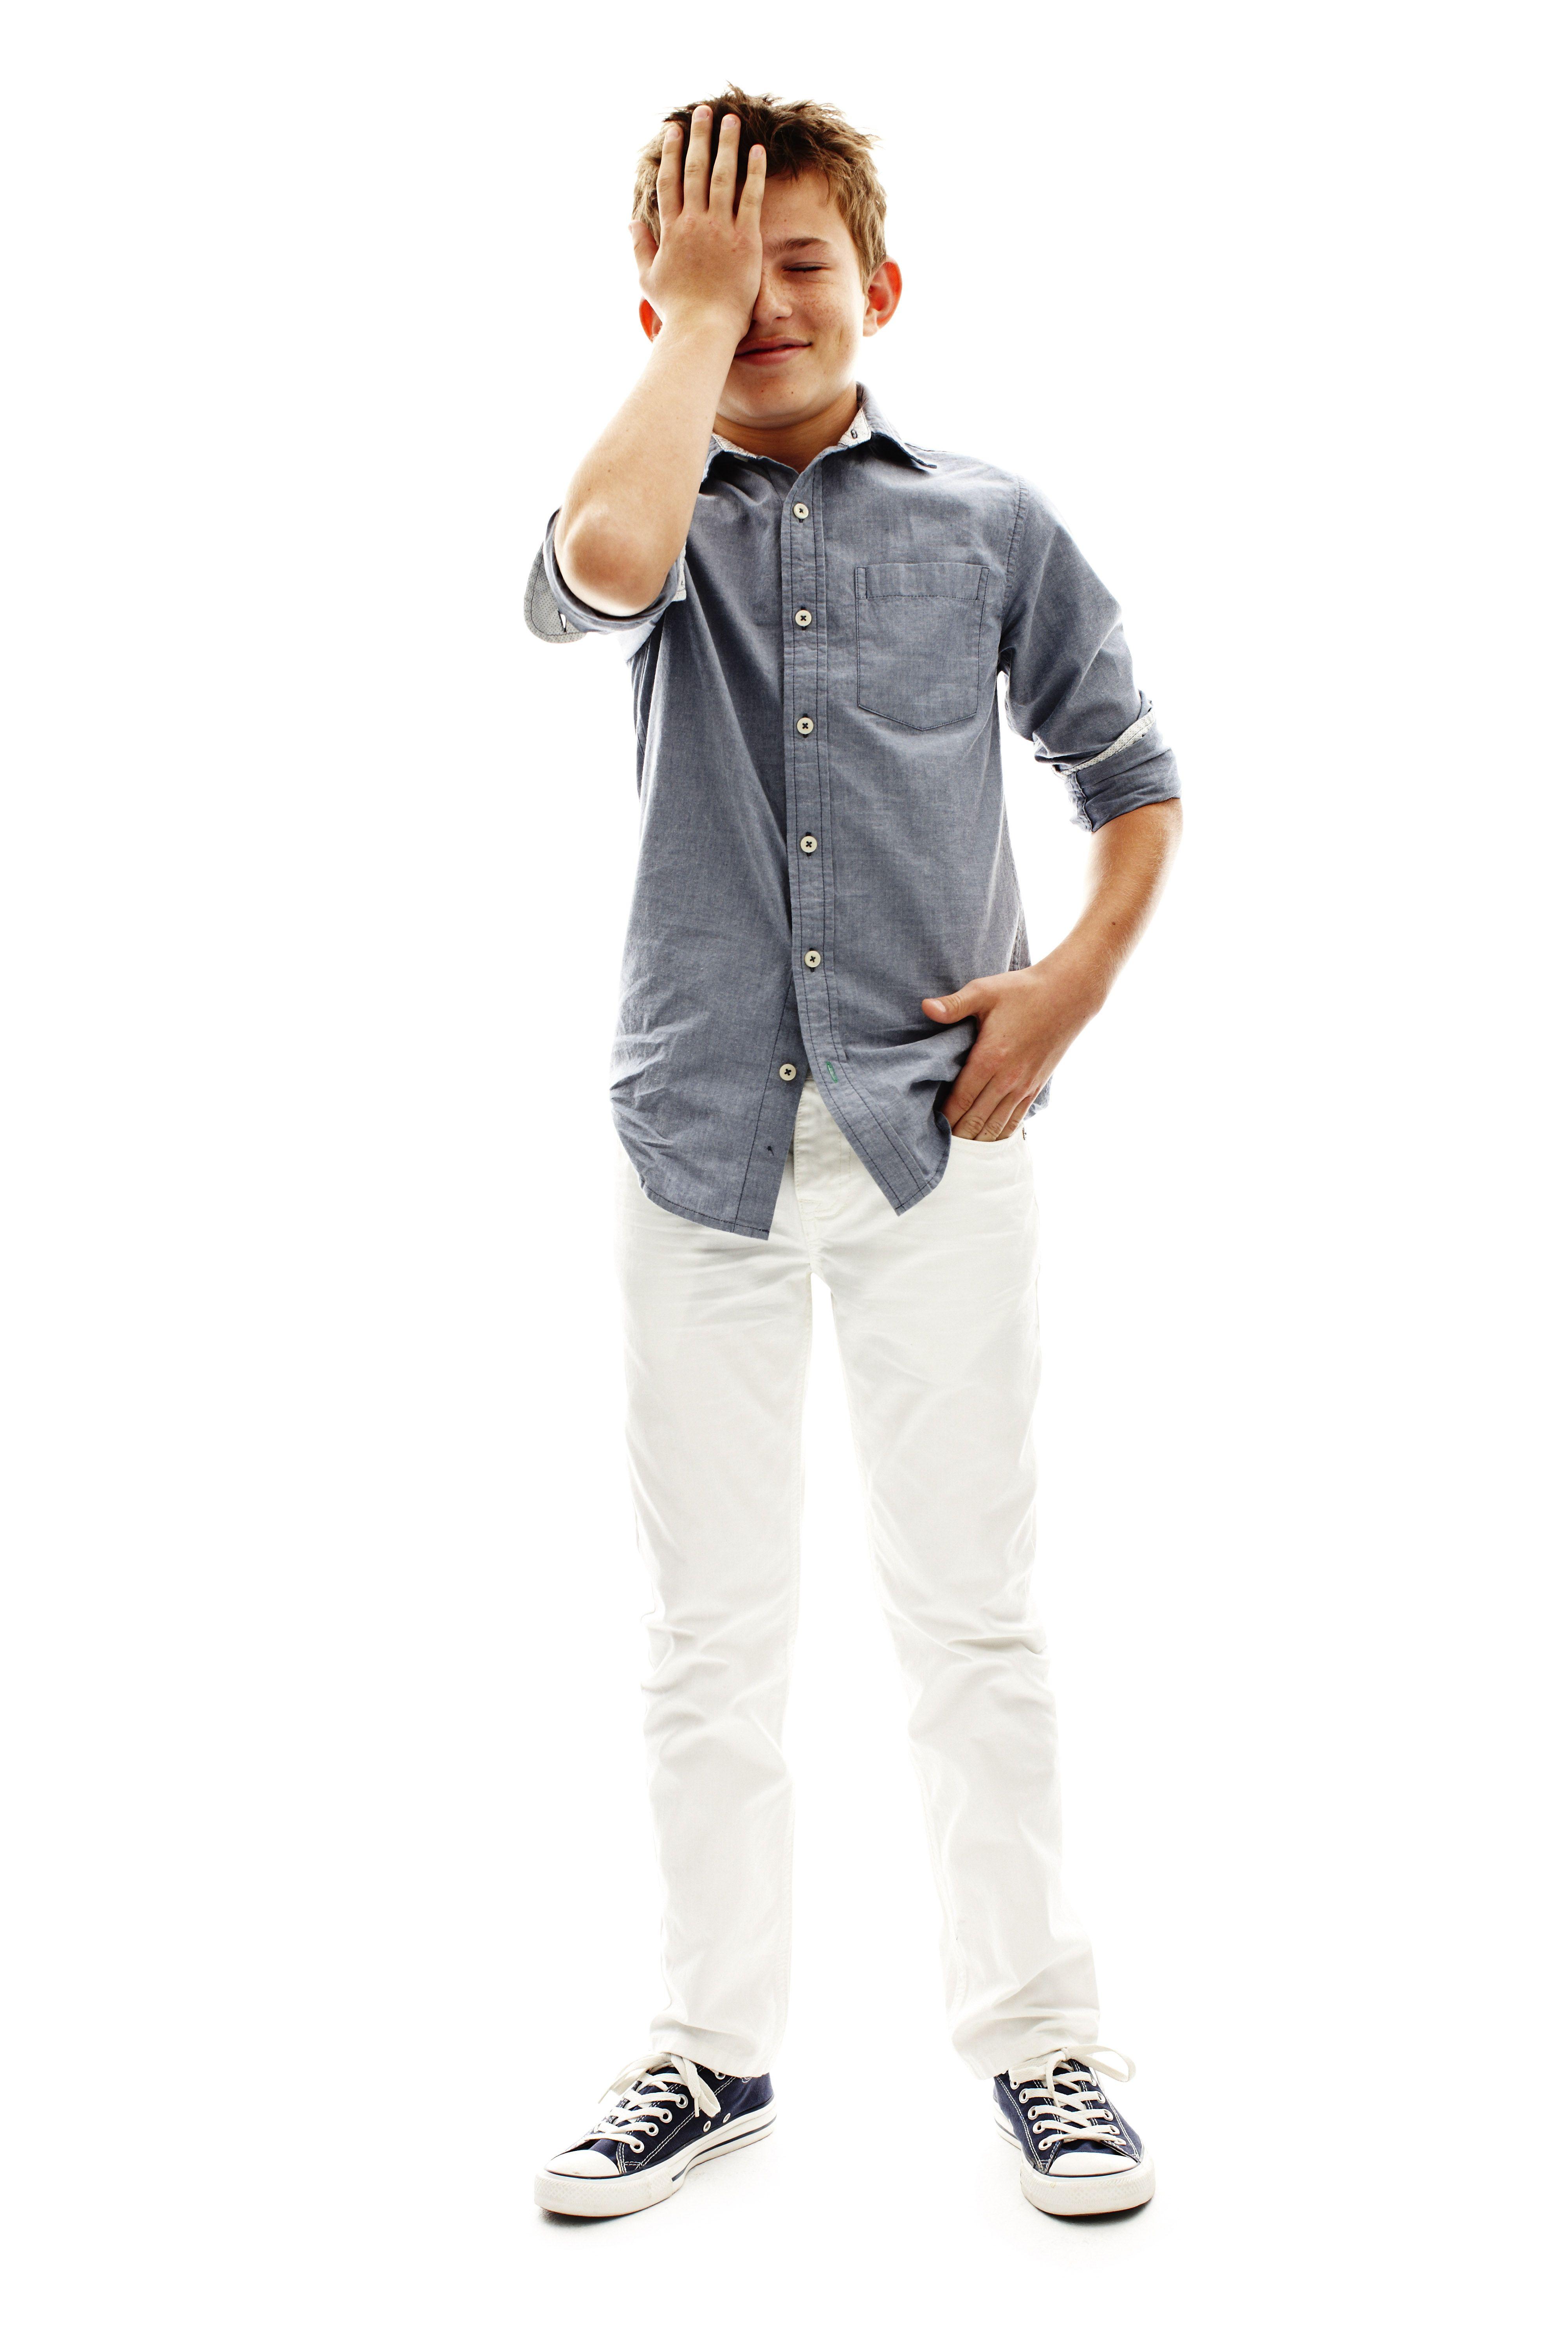 Arizona Boys Woven Shirt And Skinny Jeans Tween Boy Fashion Tween Boy Outfits